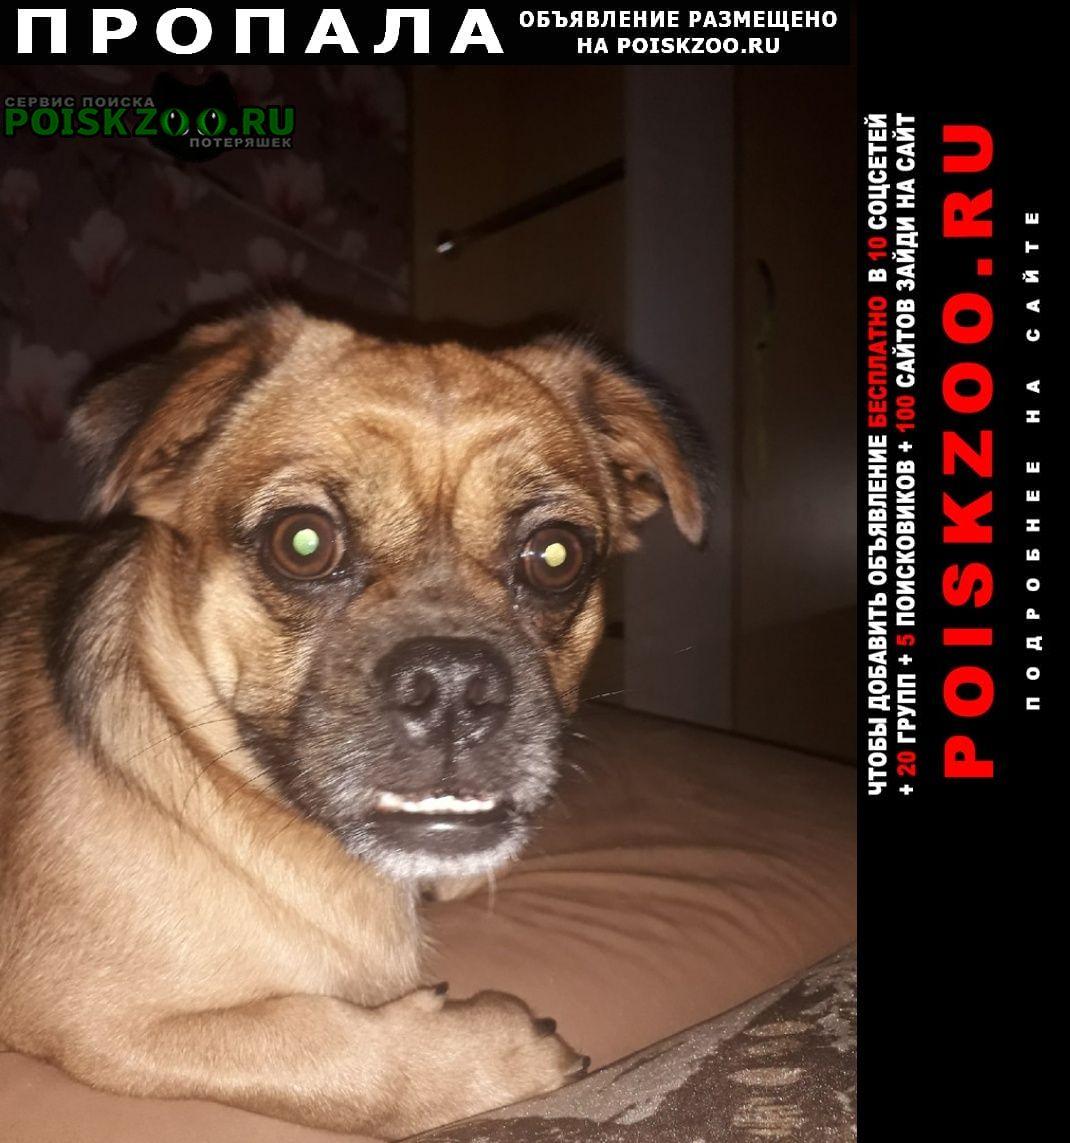 Пропала собака помесь дворняги и мопса Владивосток